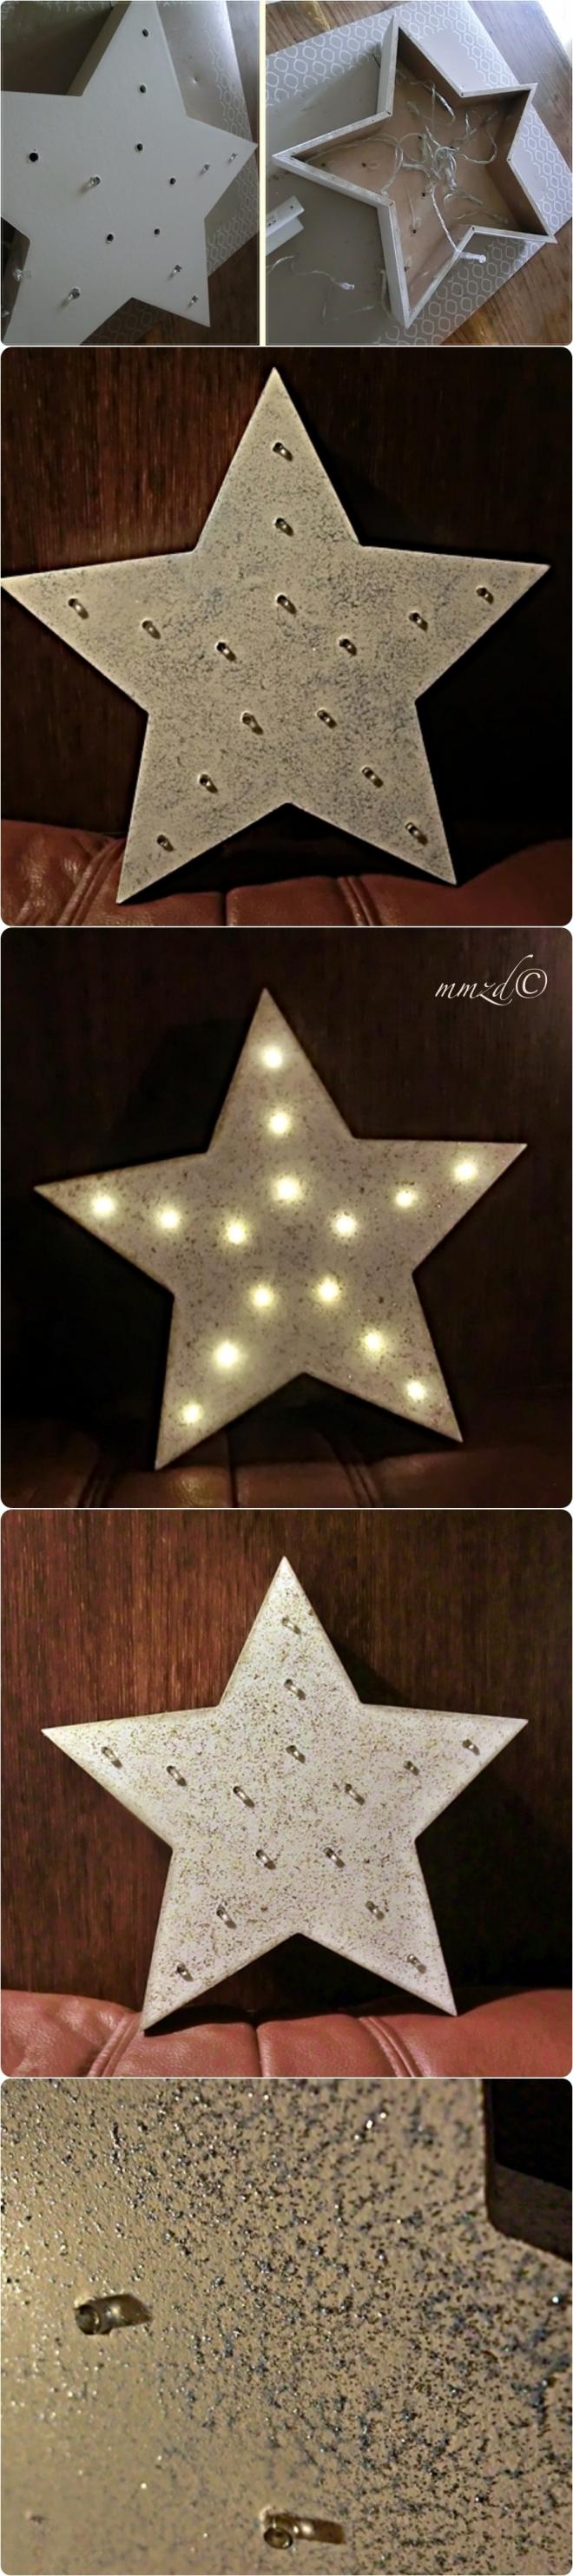 stelles1-down